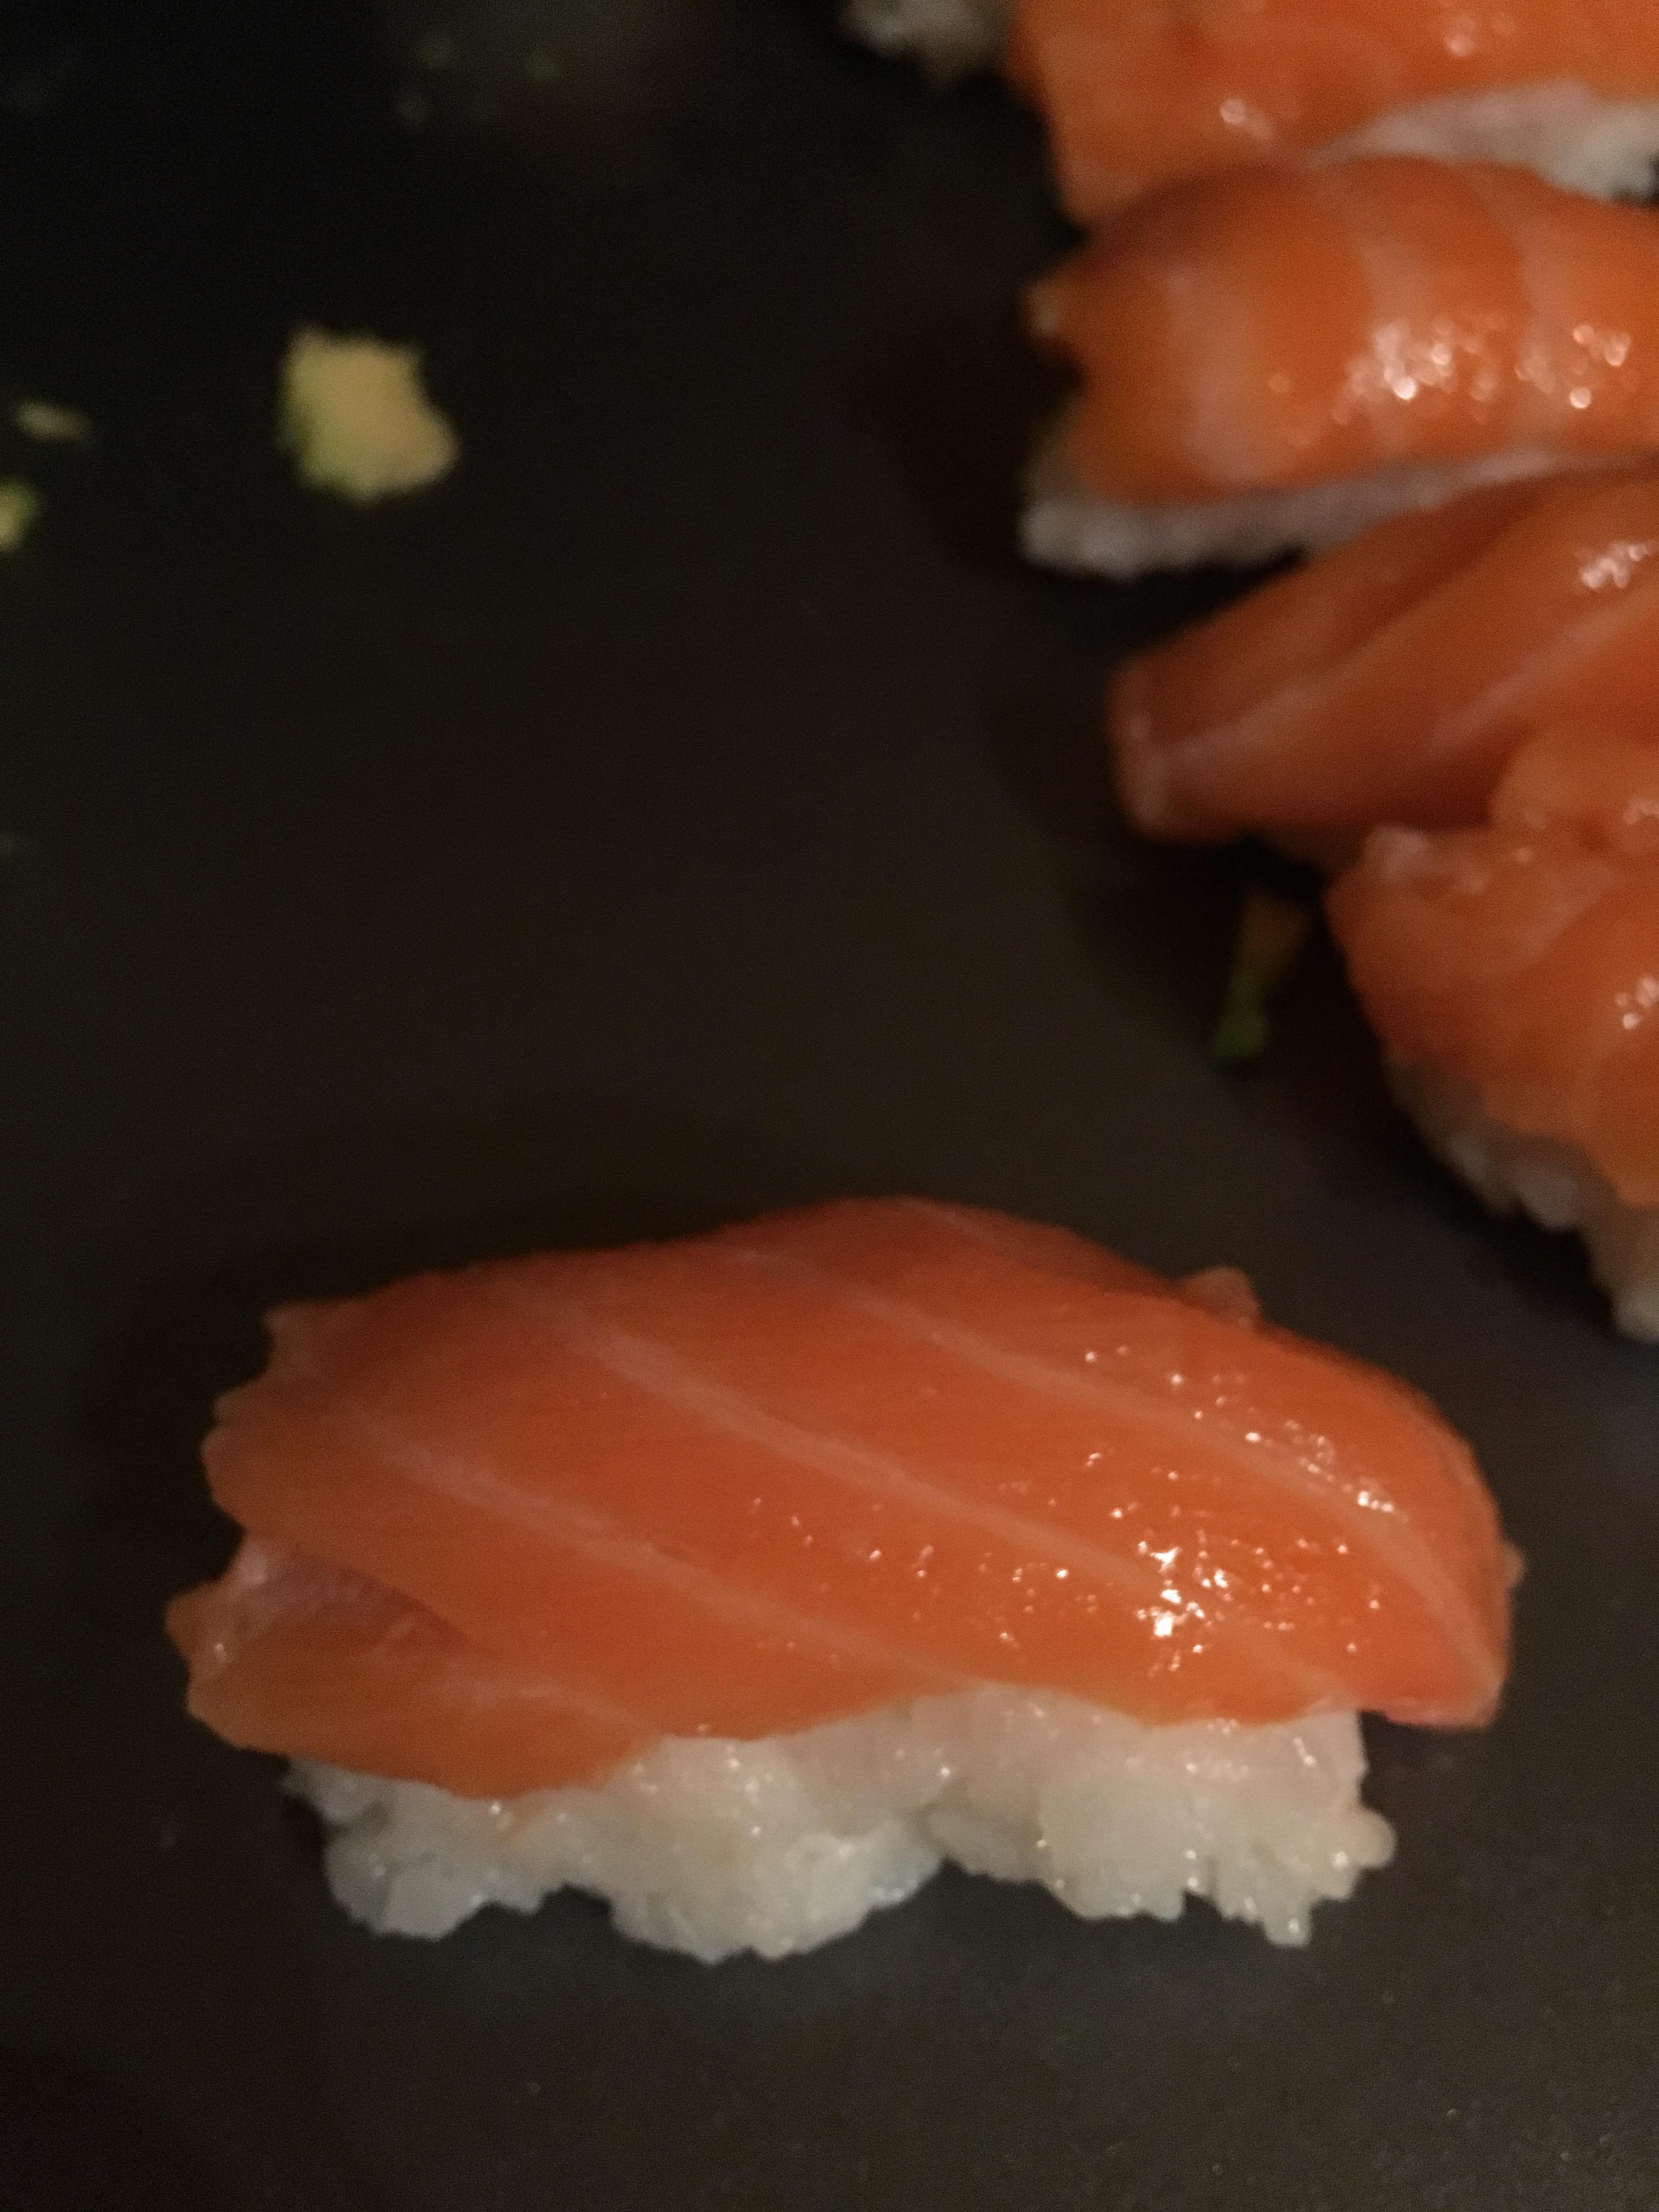 [Homemade] Salon nigiri style sushi #recipes #food #cooking #delicious #foodie #foodrecipes #cook #recipe #health